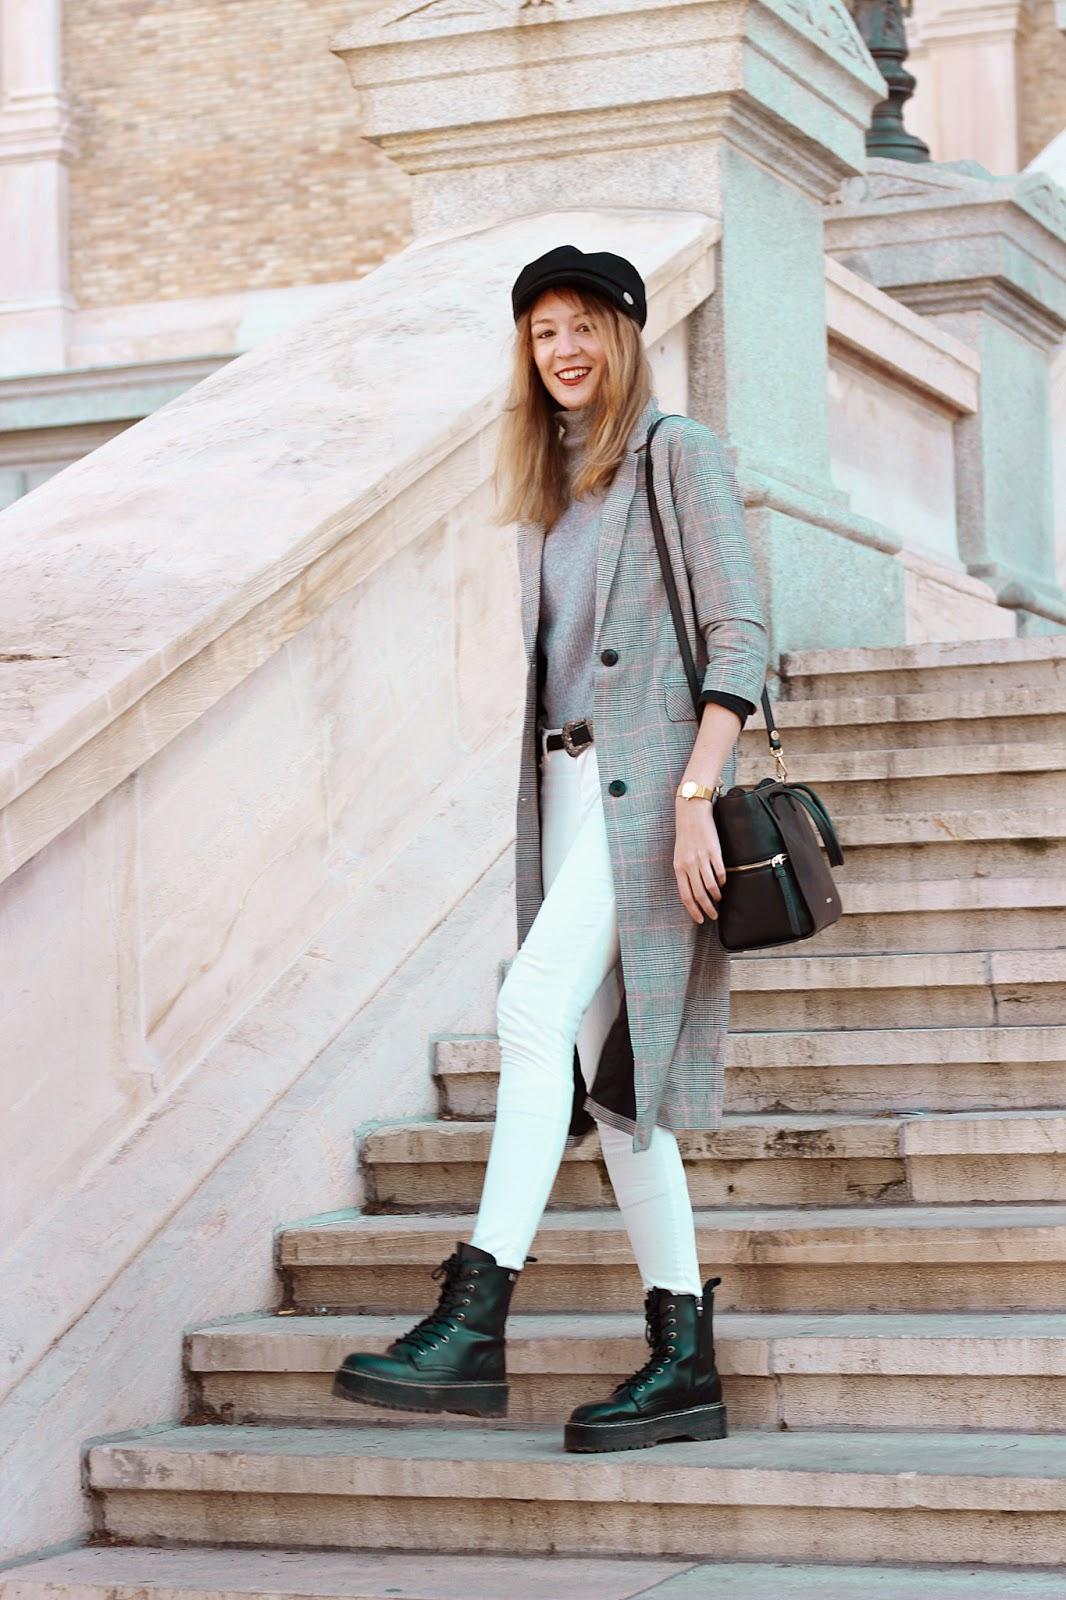 British-style-instagram-biscuit-store-coat-acosta-carmen-black-bag-dr-martens-platform-boots